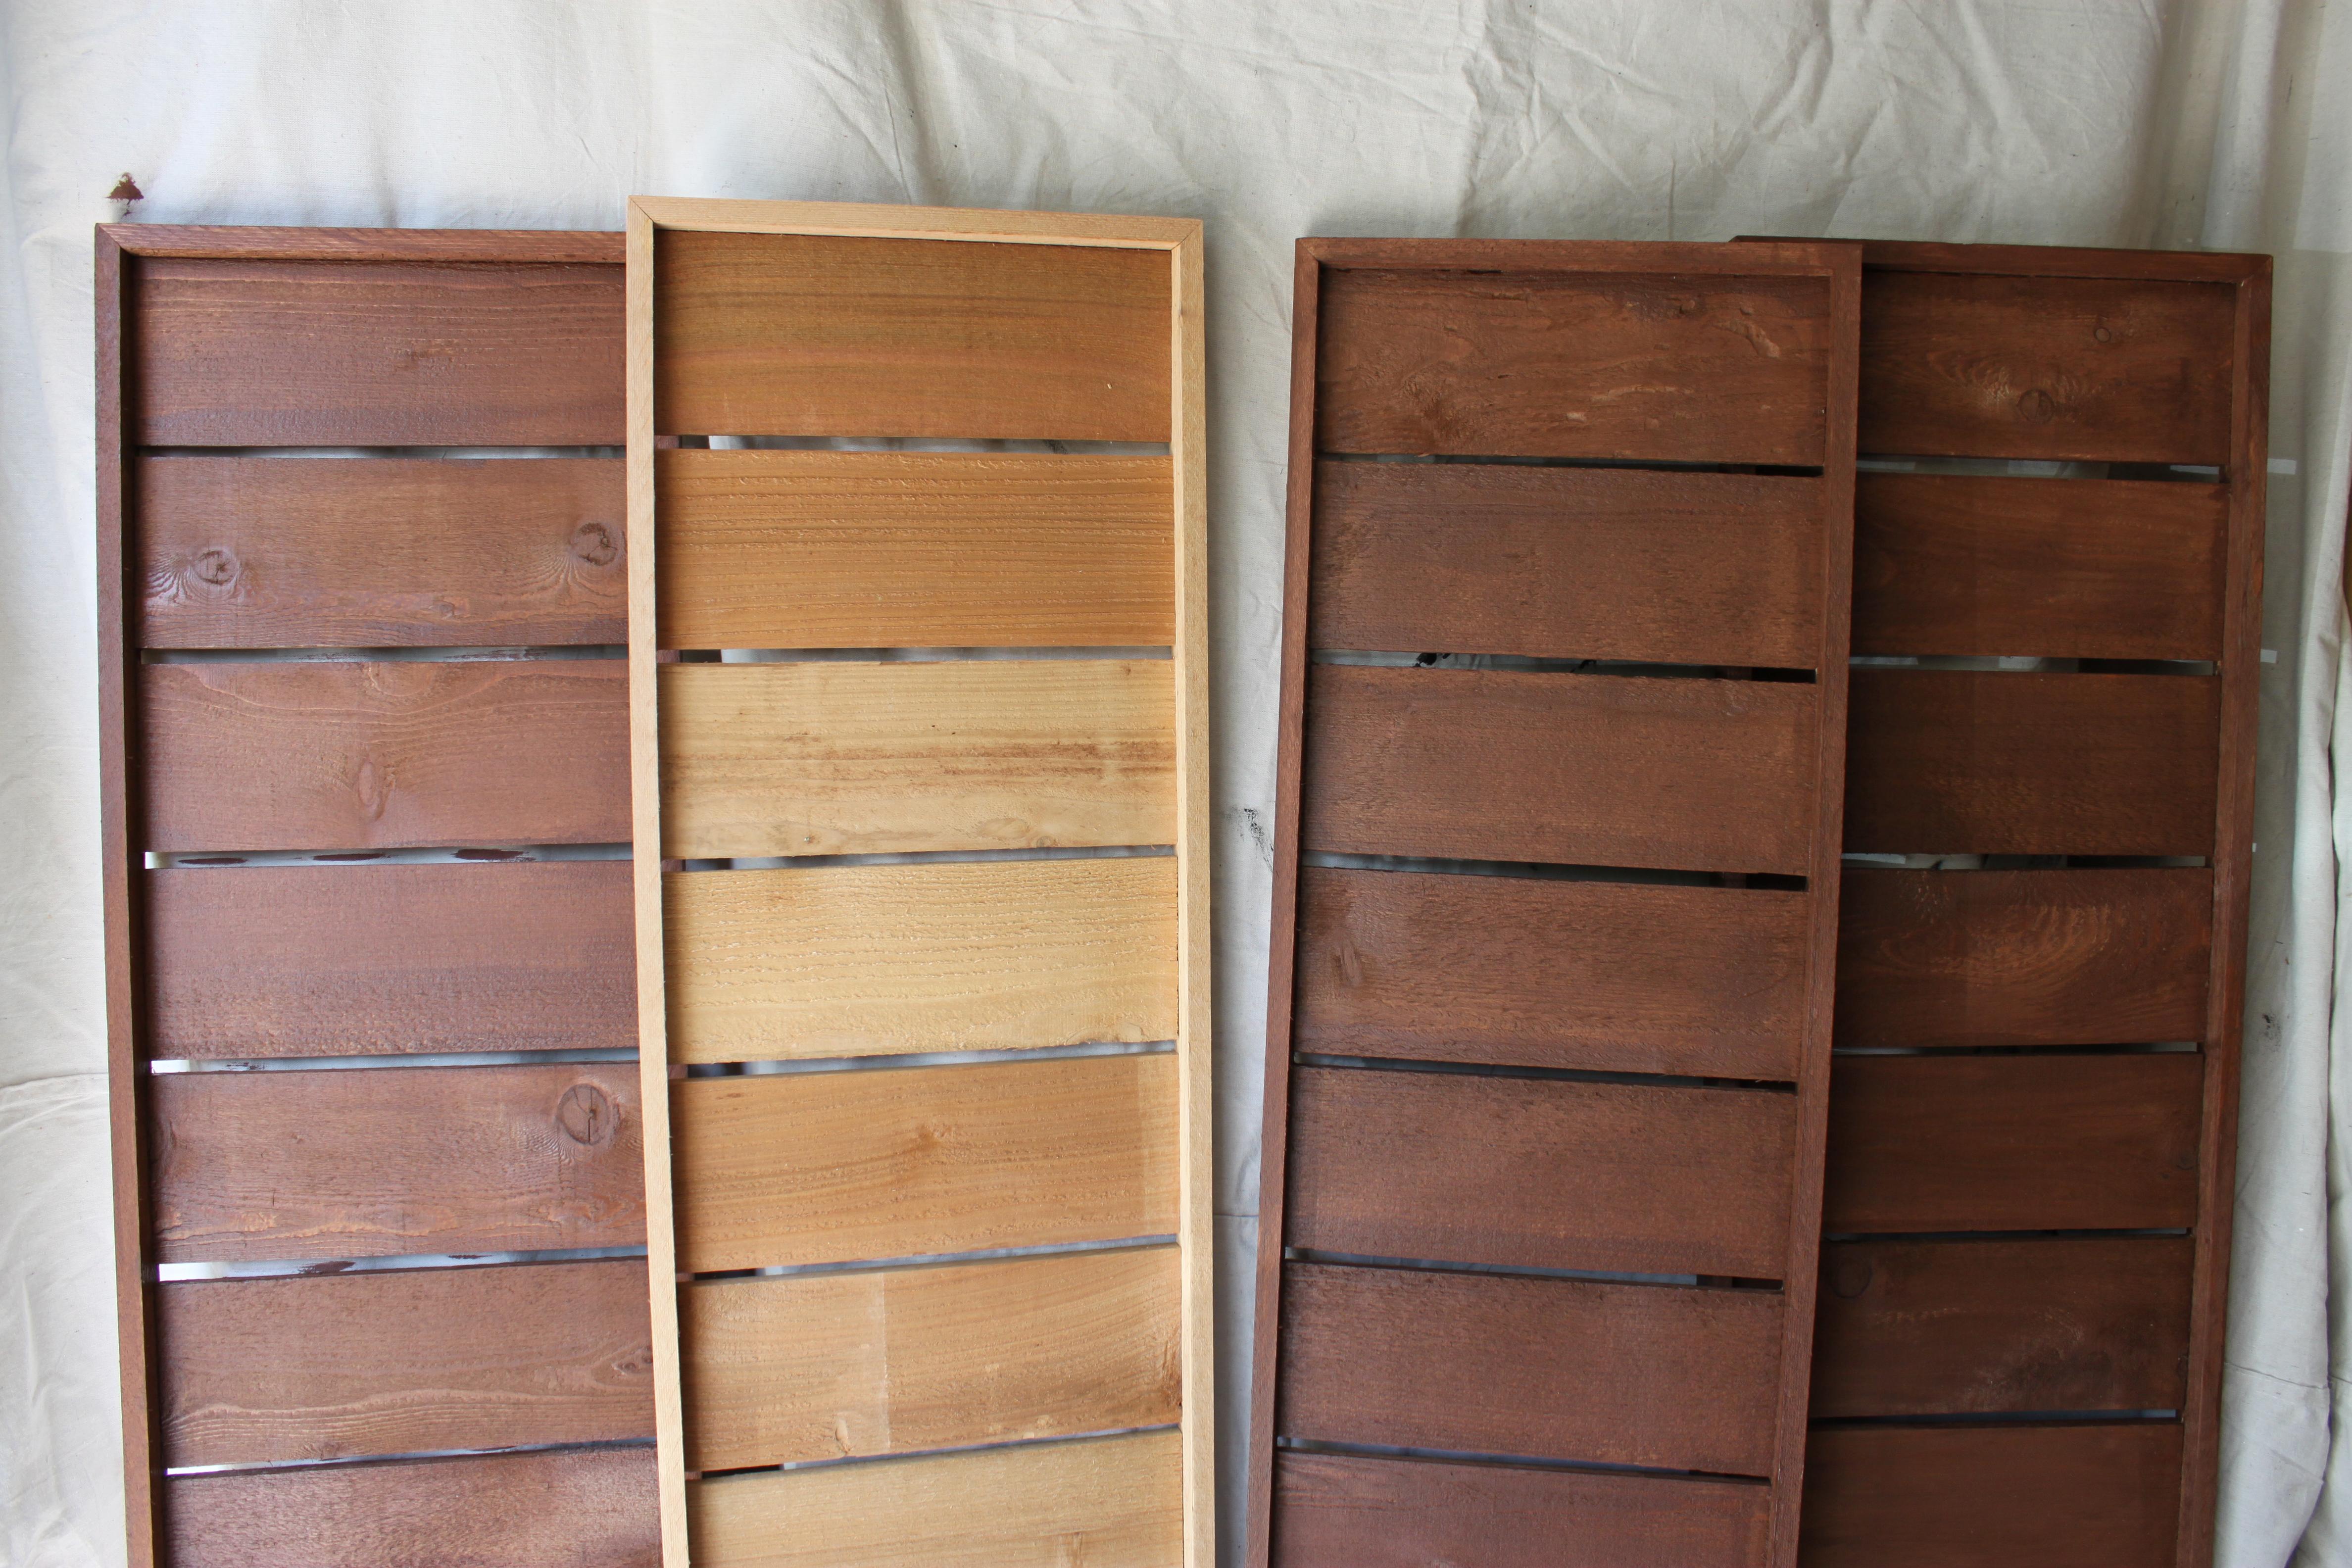 Modern Cedar Shutters  The Cavender Diary. Svarta Bunk Bed. Create Your Own Wallpaper. Cobblestone Driveway. Contemporary Decorative Pillows. Japanese Furniture. Modern Headboards. Custom Medicine Cabinets. Take It For Granite